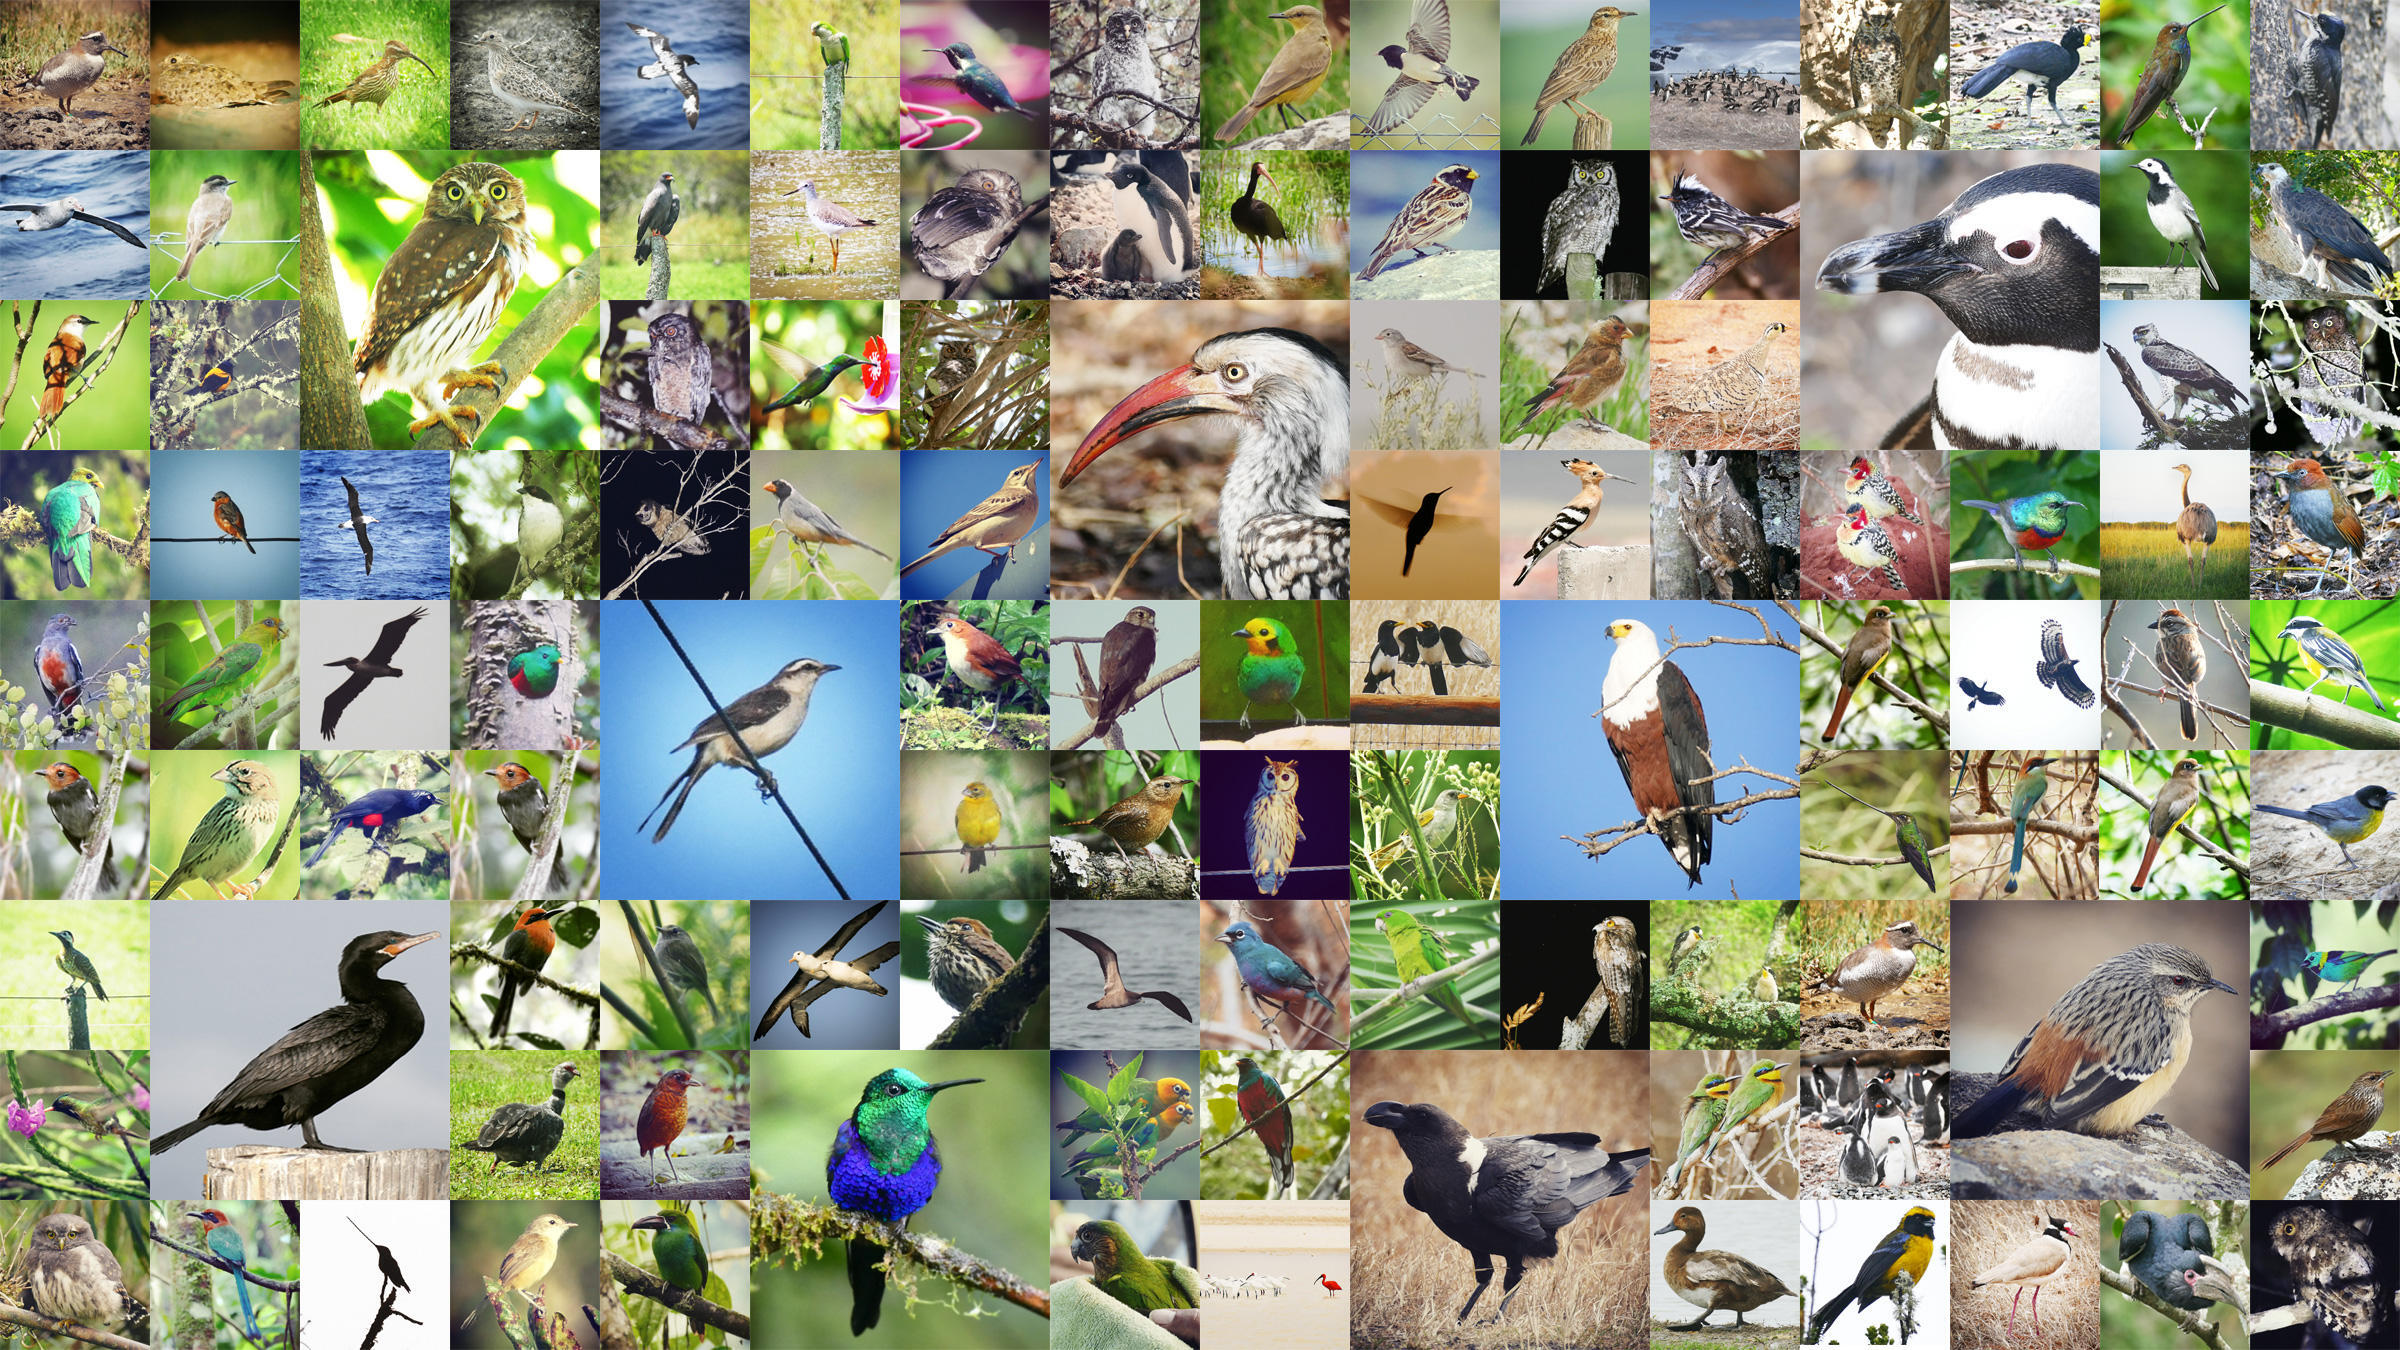 A mosaic of birds found on Noah Strycker's Biggest Year in 2015. Photos: Noah Strycker